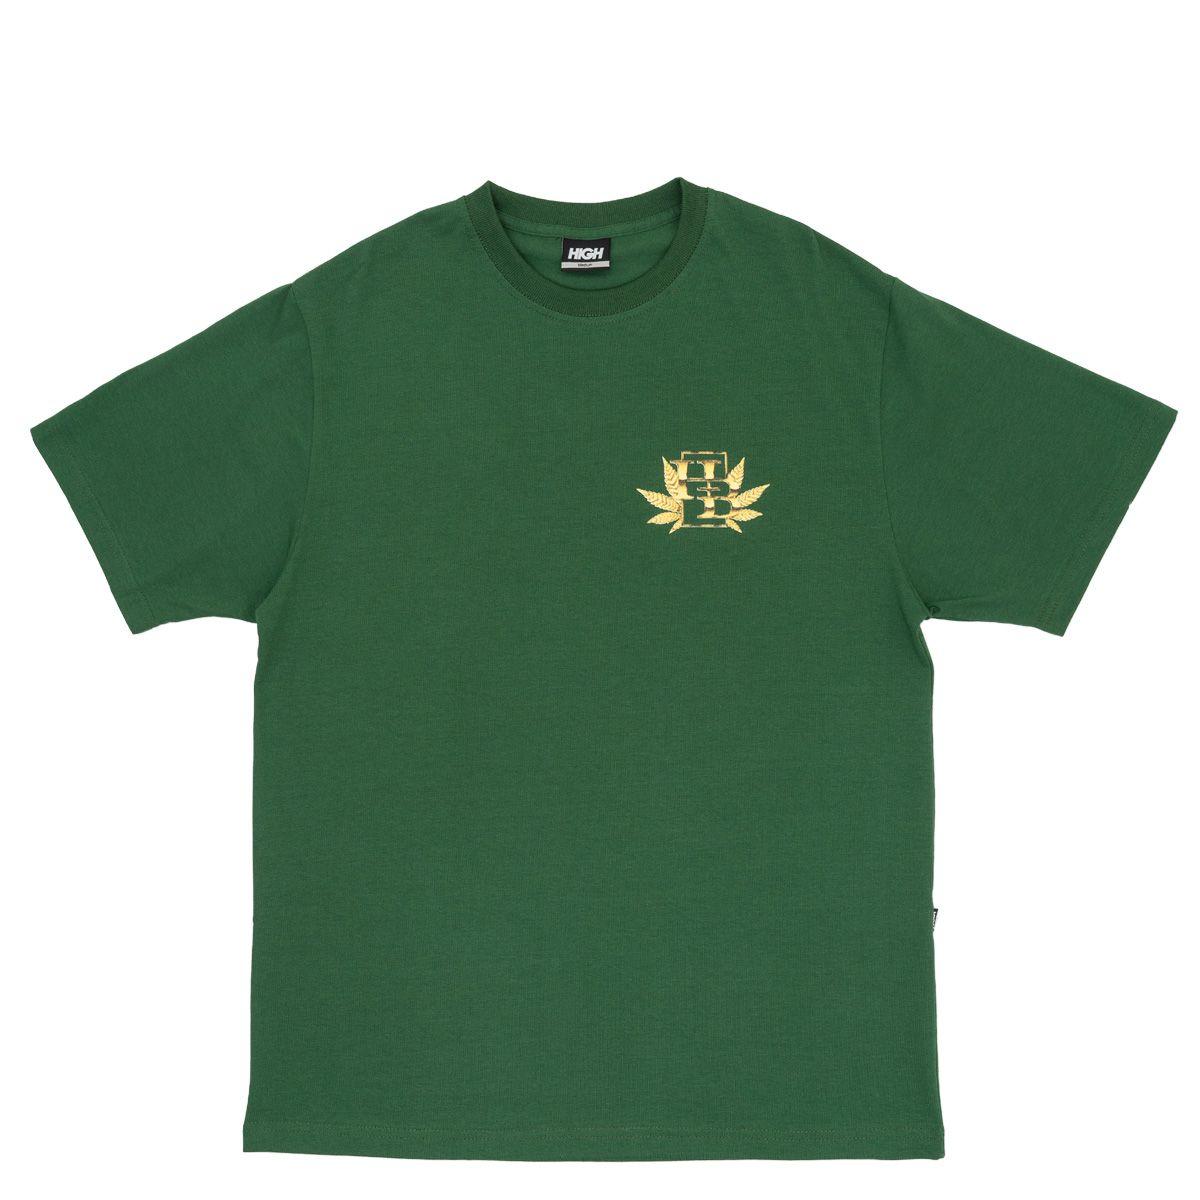 Camiseta High Tee Club Green